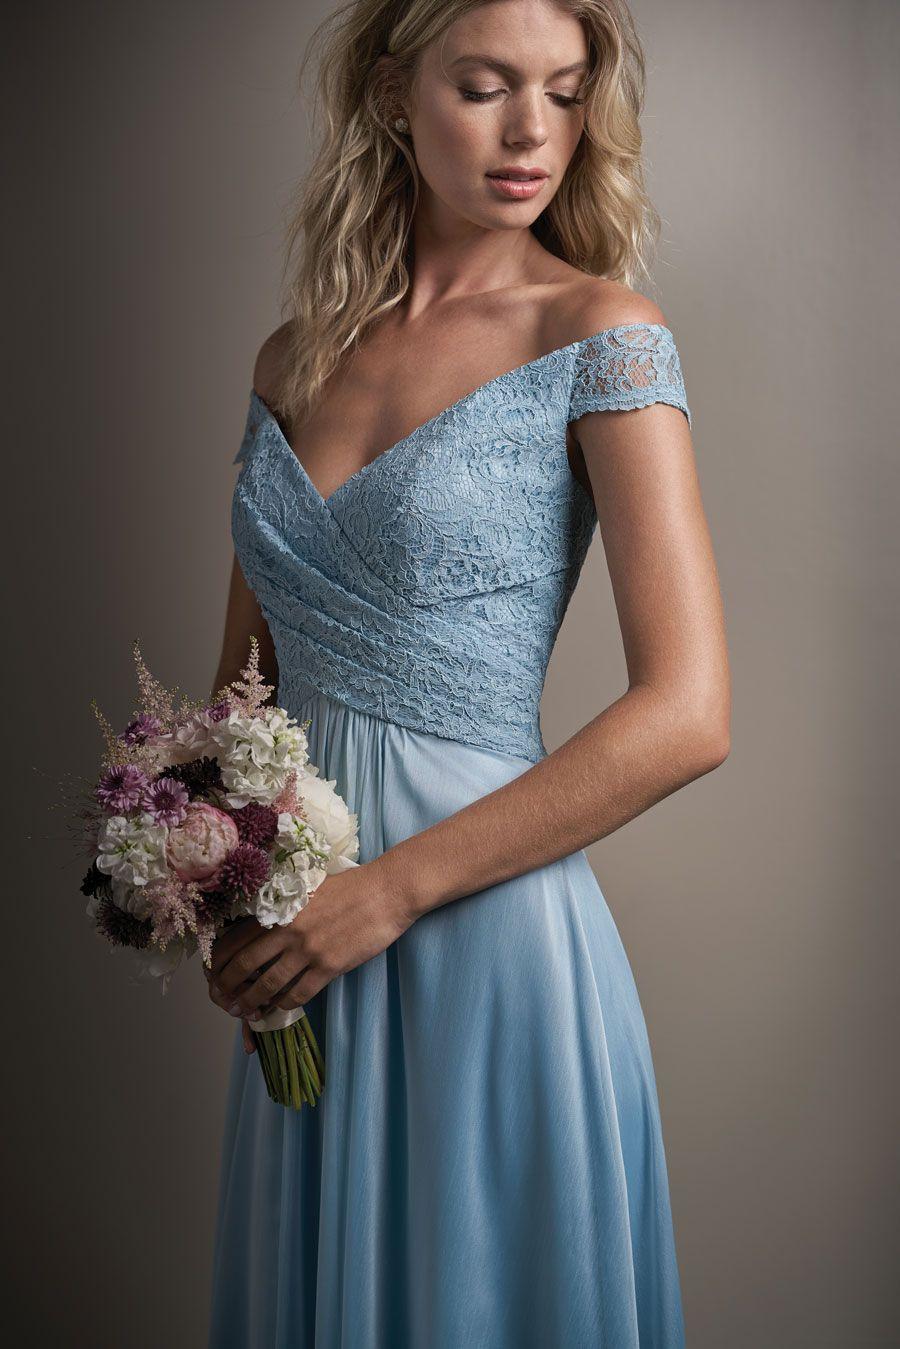 63 beautiful blue bridesmaids dresses gallery image 26